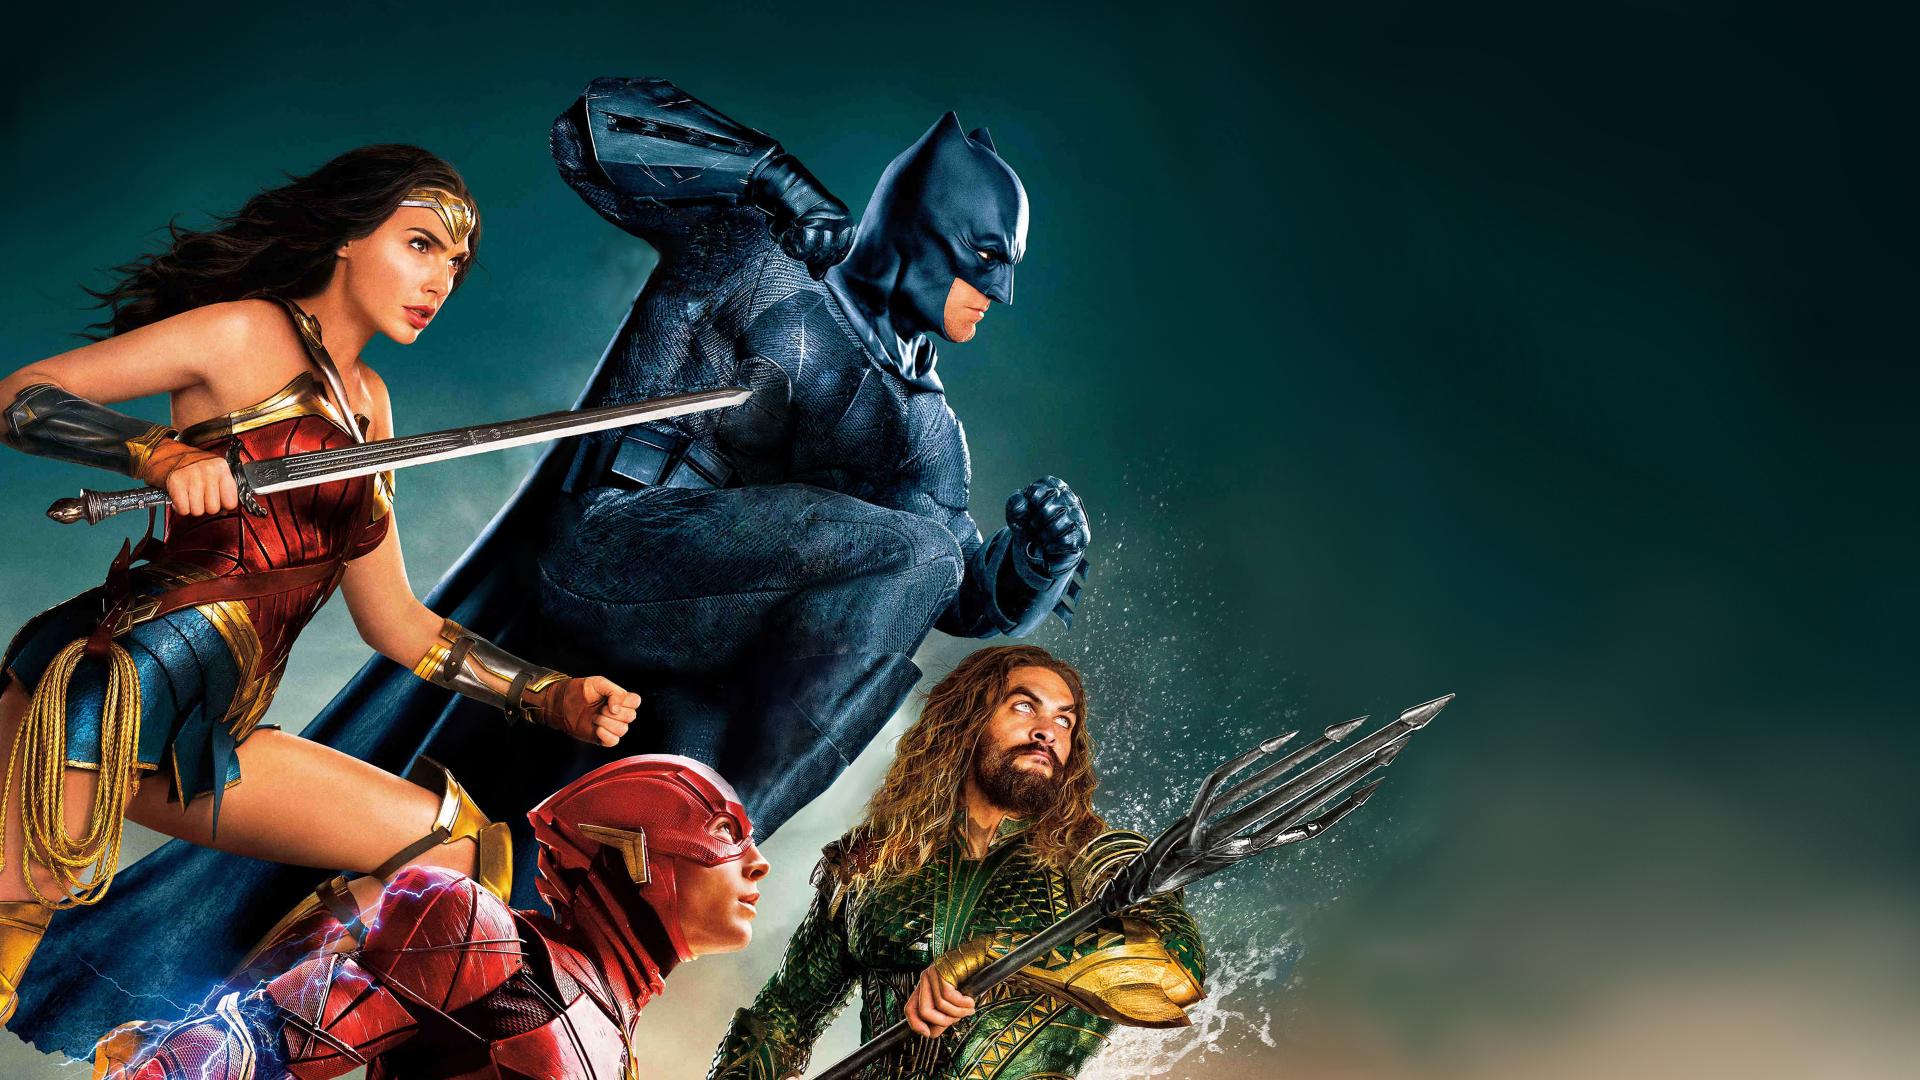 Download 1920x1080 Wallpaper Justice League Batman Wonder Woman